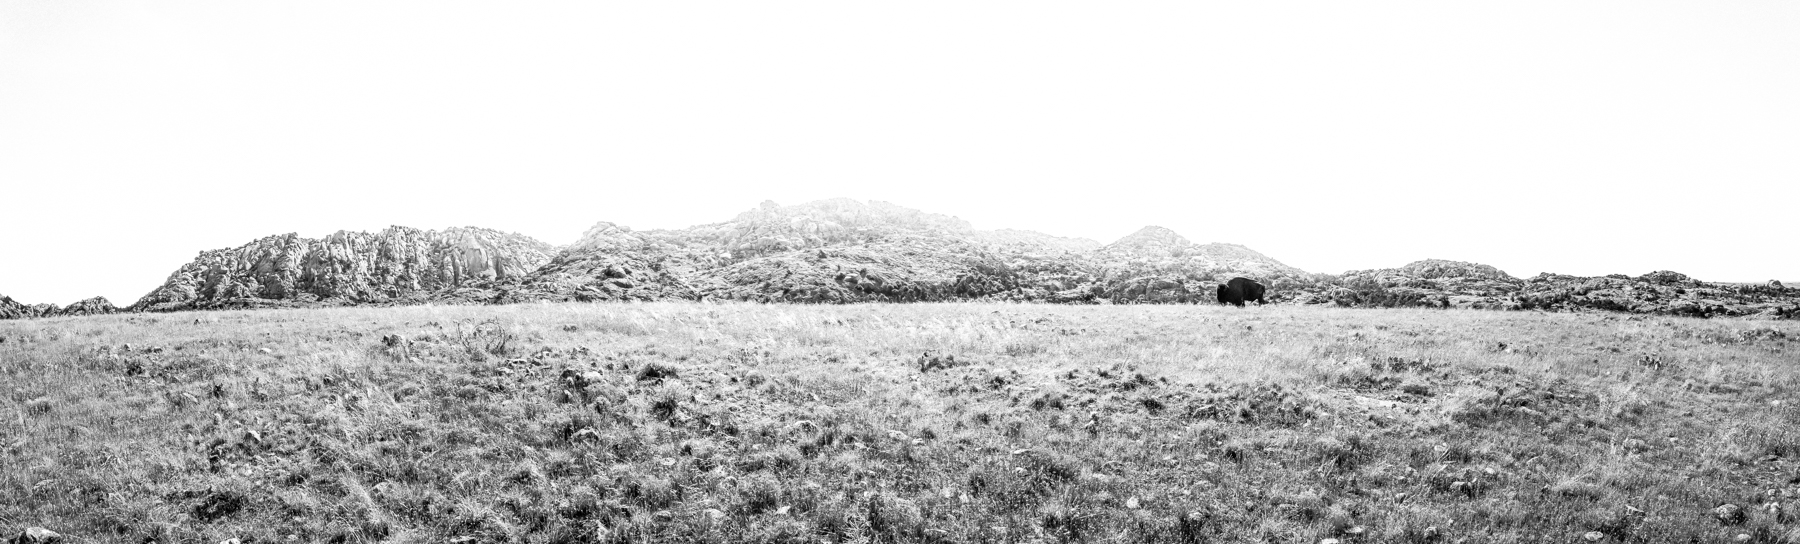 2017-06-25 Mount Lincoln B (2 of 20).jpg